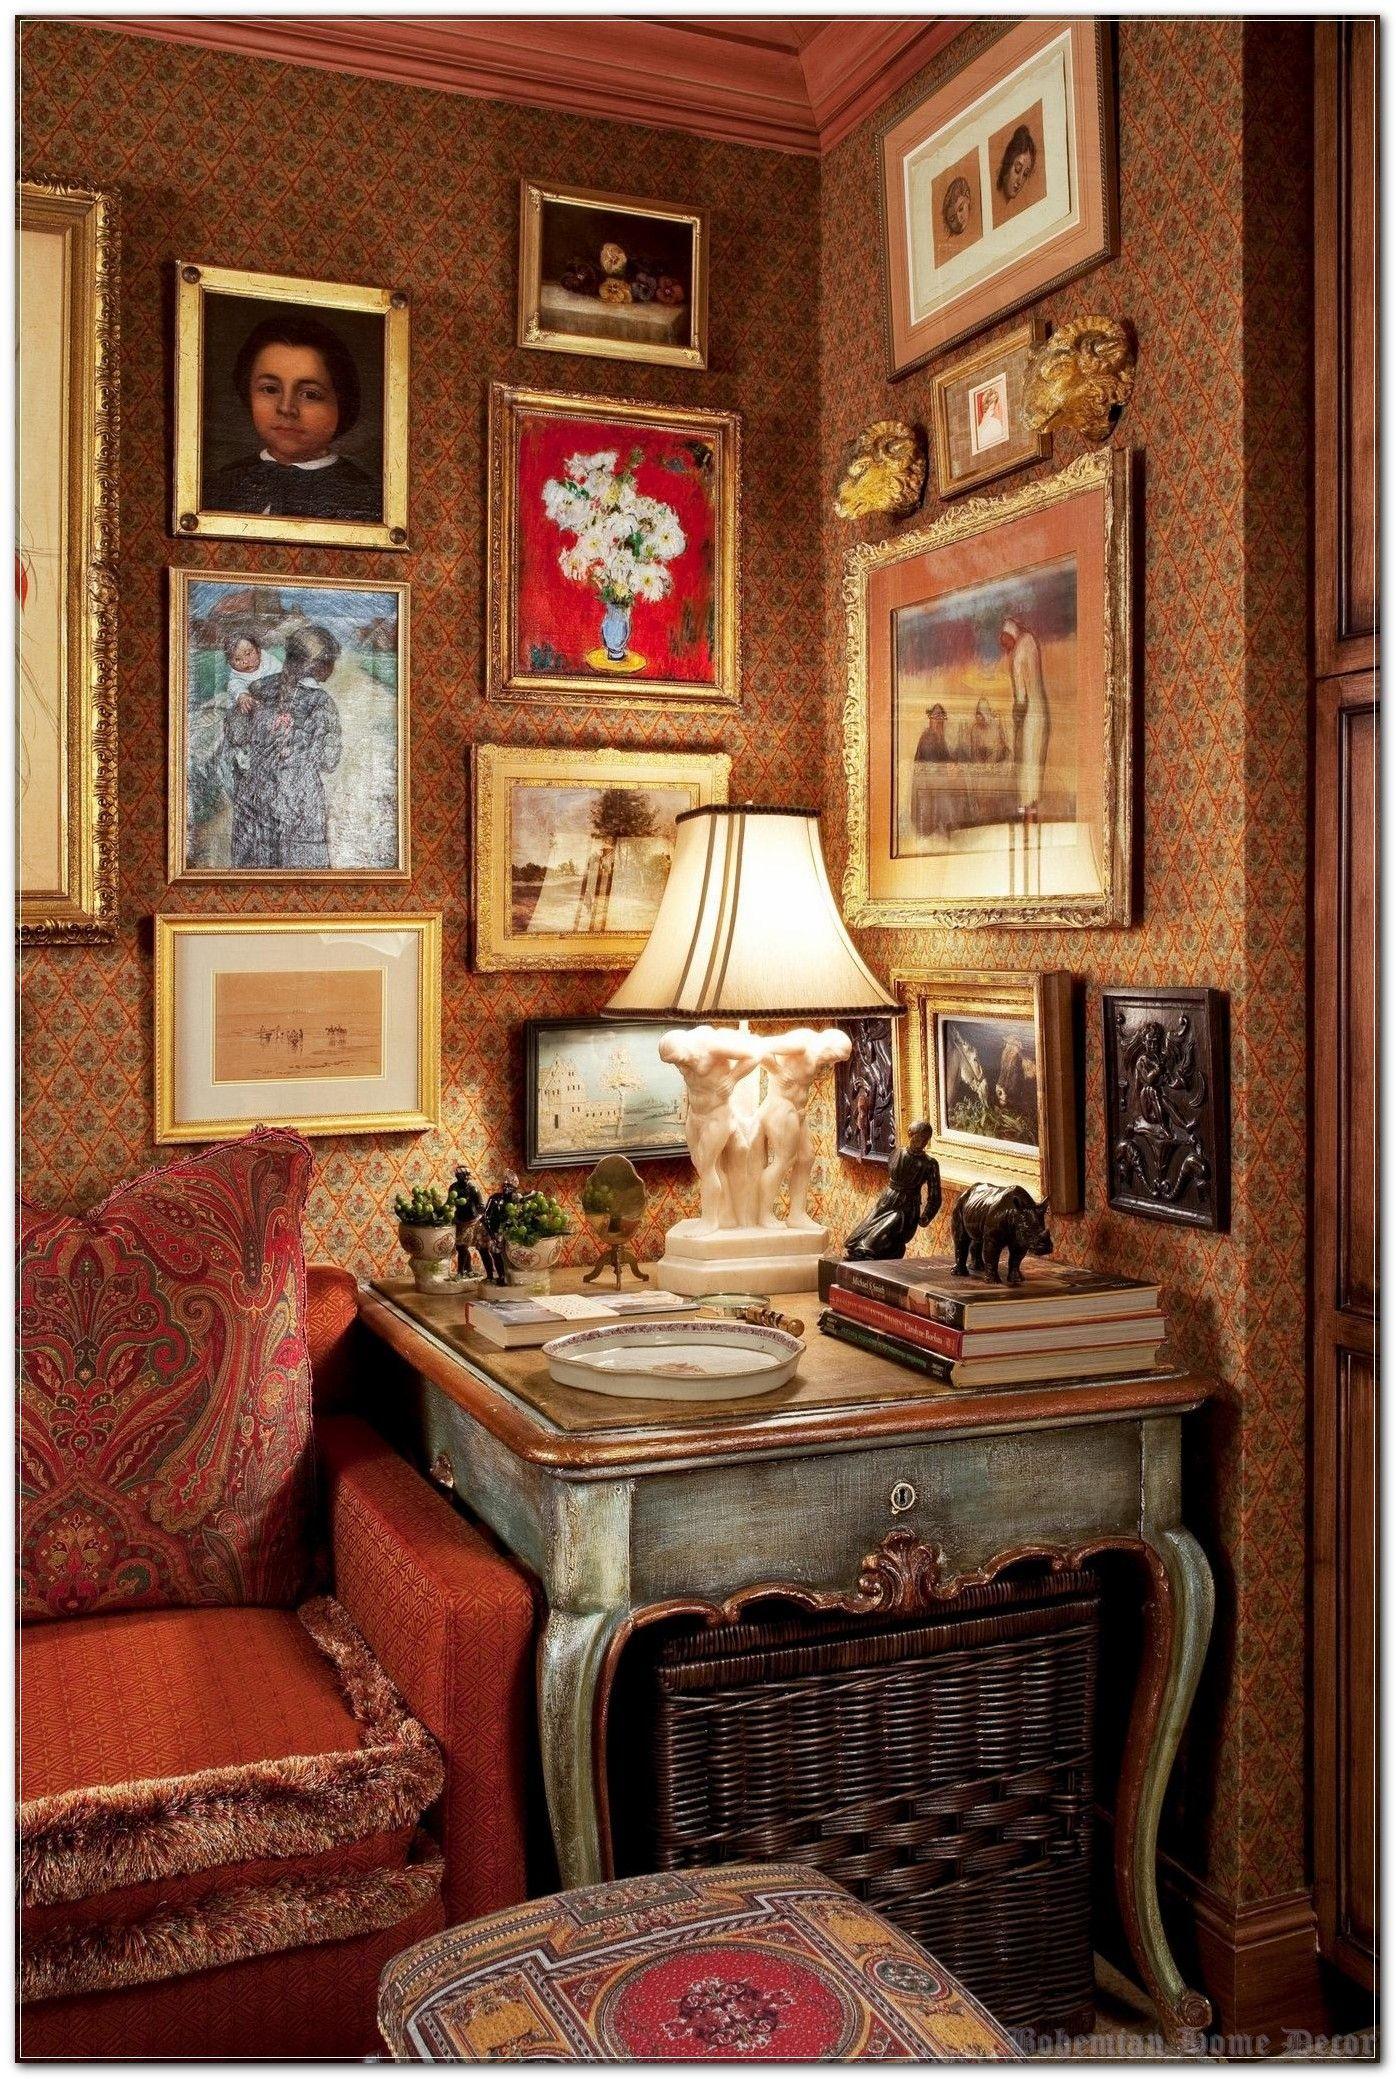 Intense Bohemian Home Decor – Blessing Or A Curse